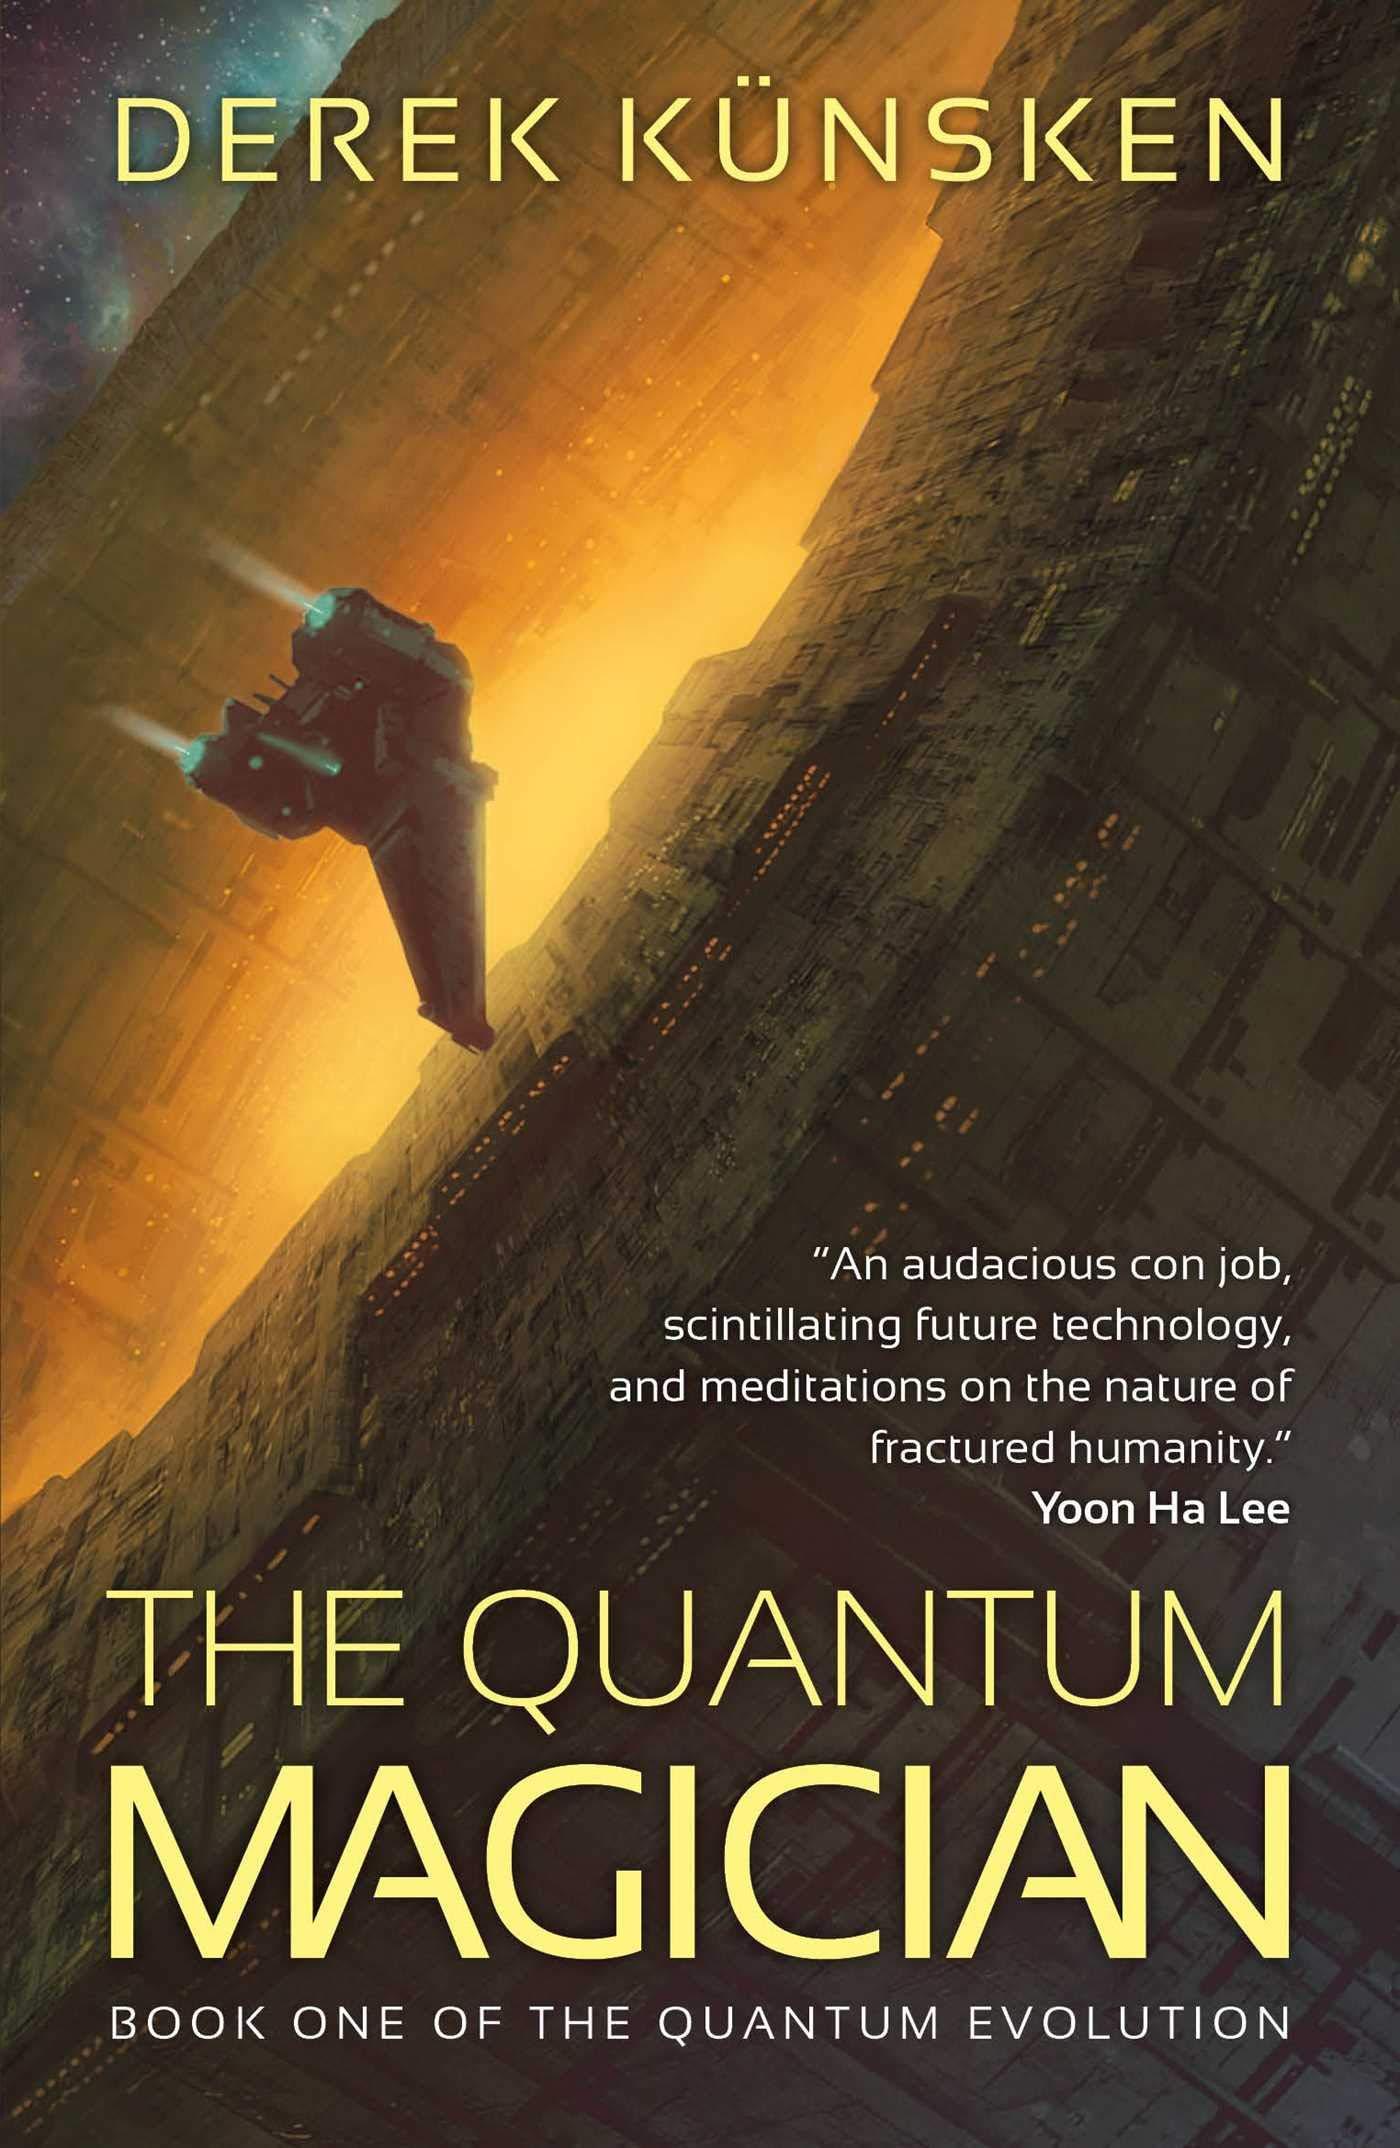 In 500 Words or Less: The Quantum Magician by Derek Künsken